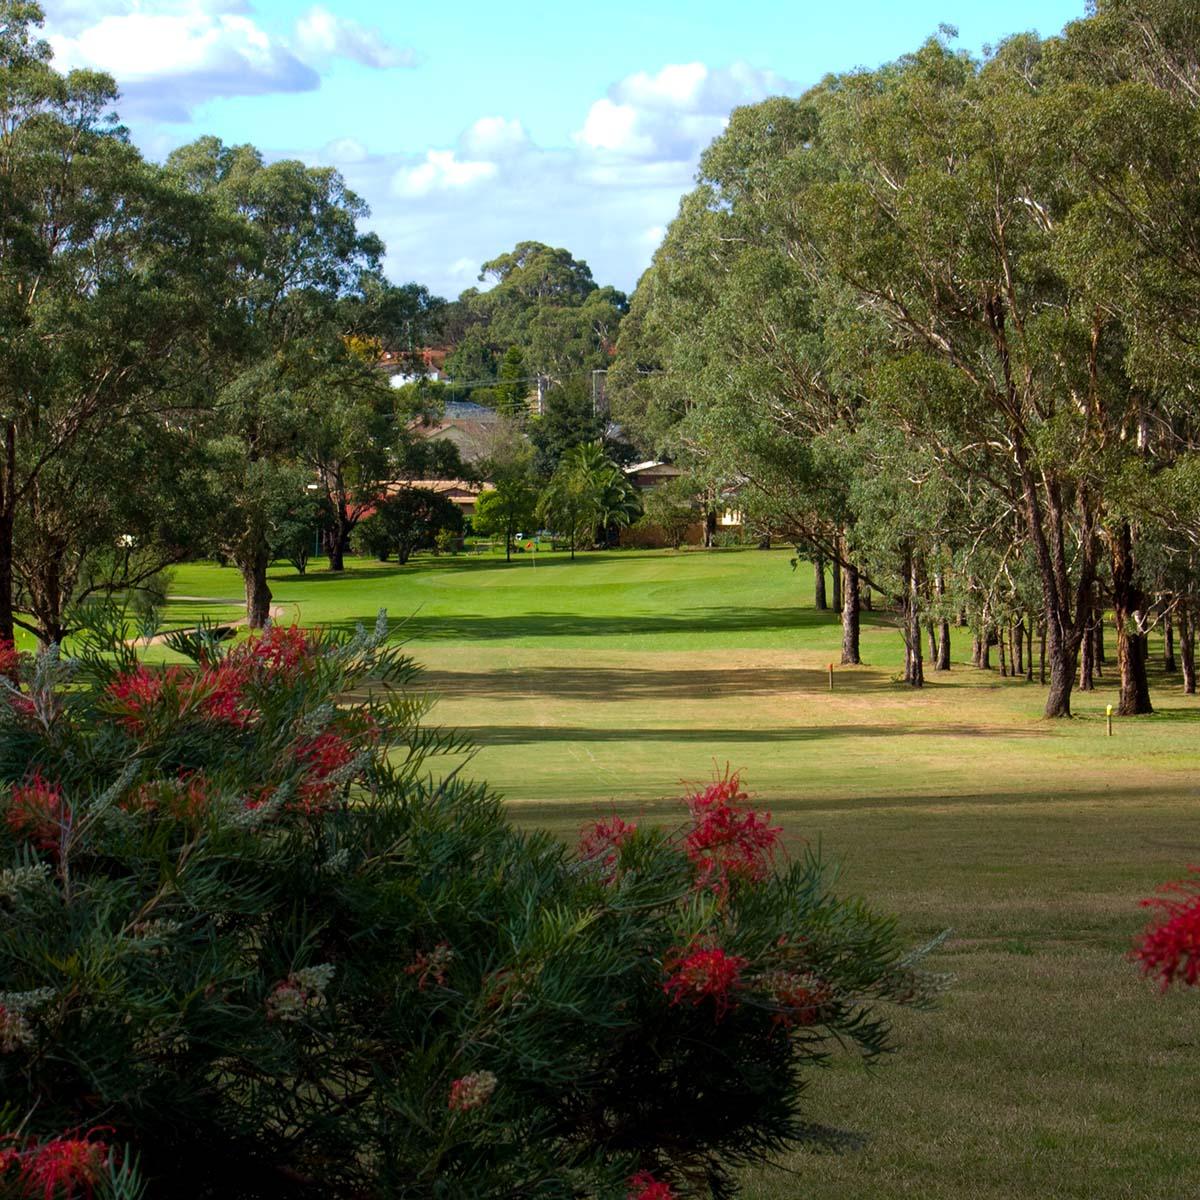 an afternoon look down a fairway at Camden Golf Club